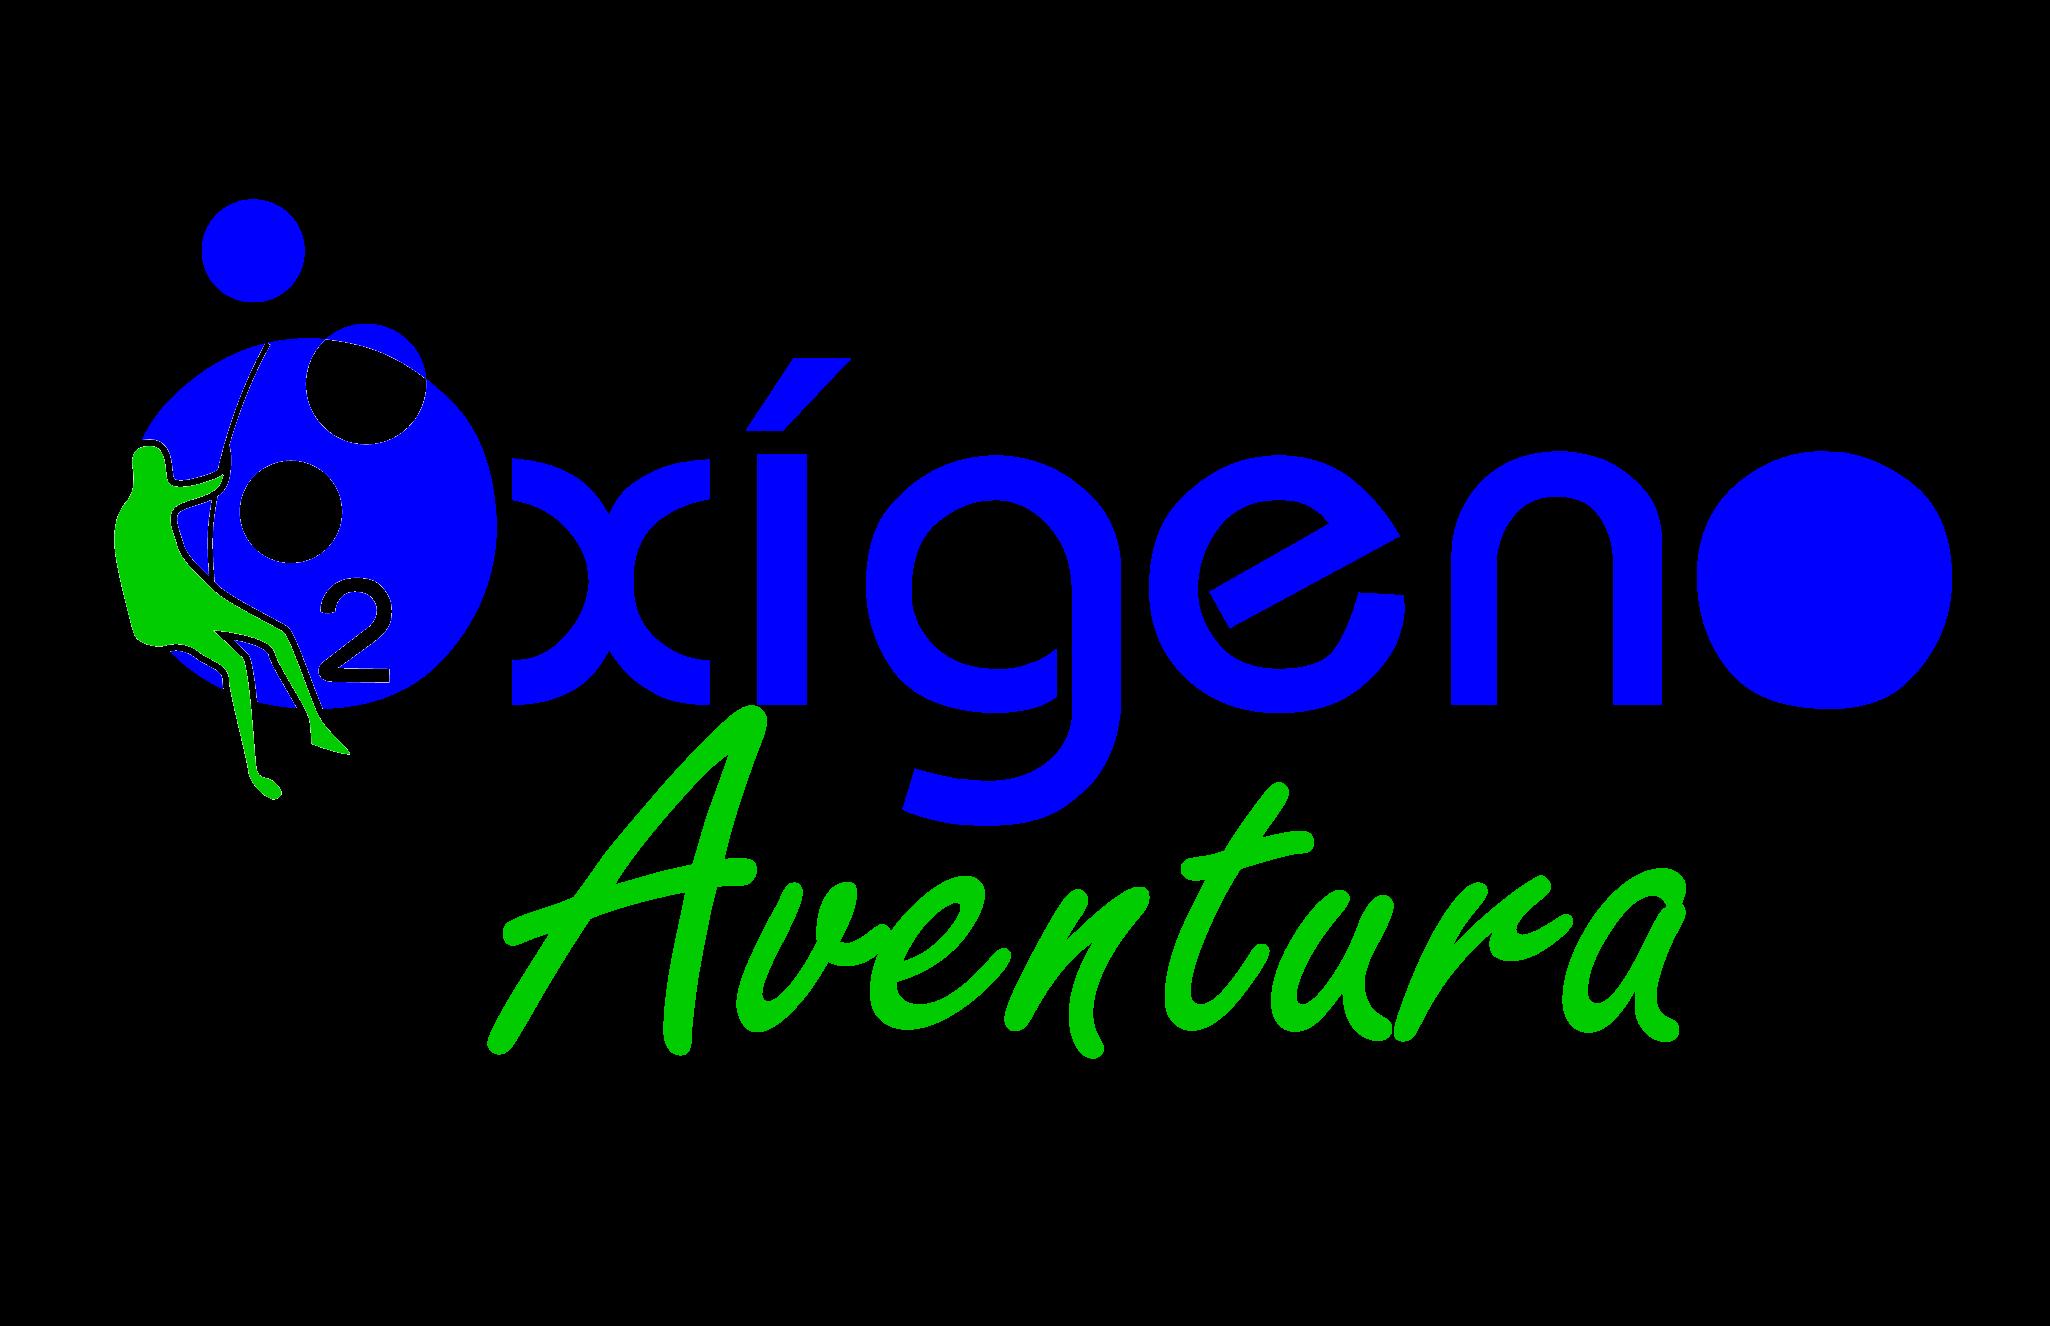 Oxigeno Aventura